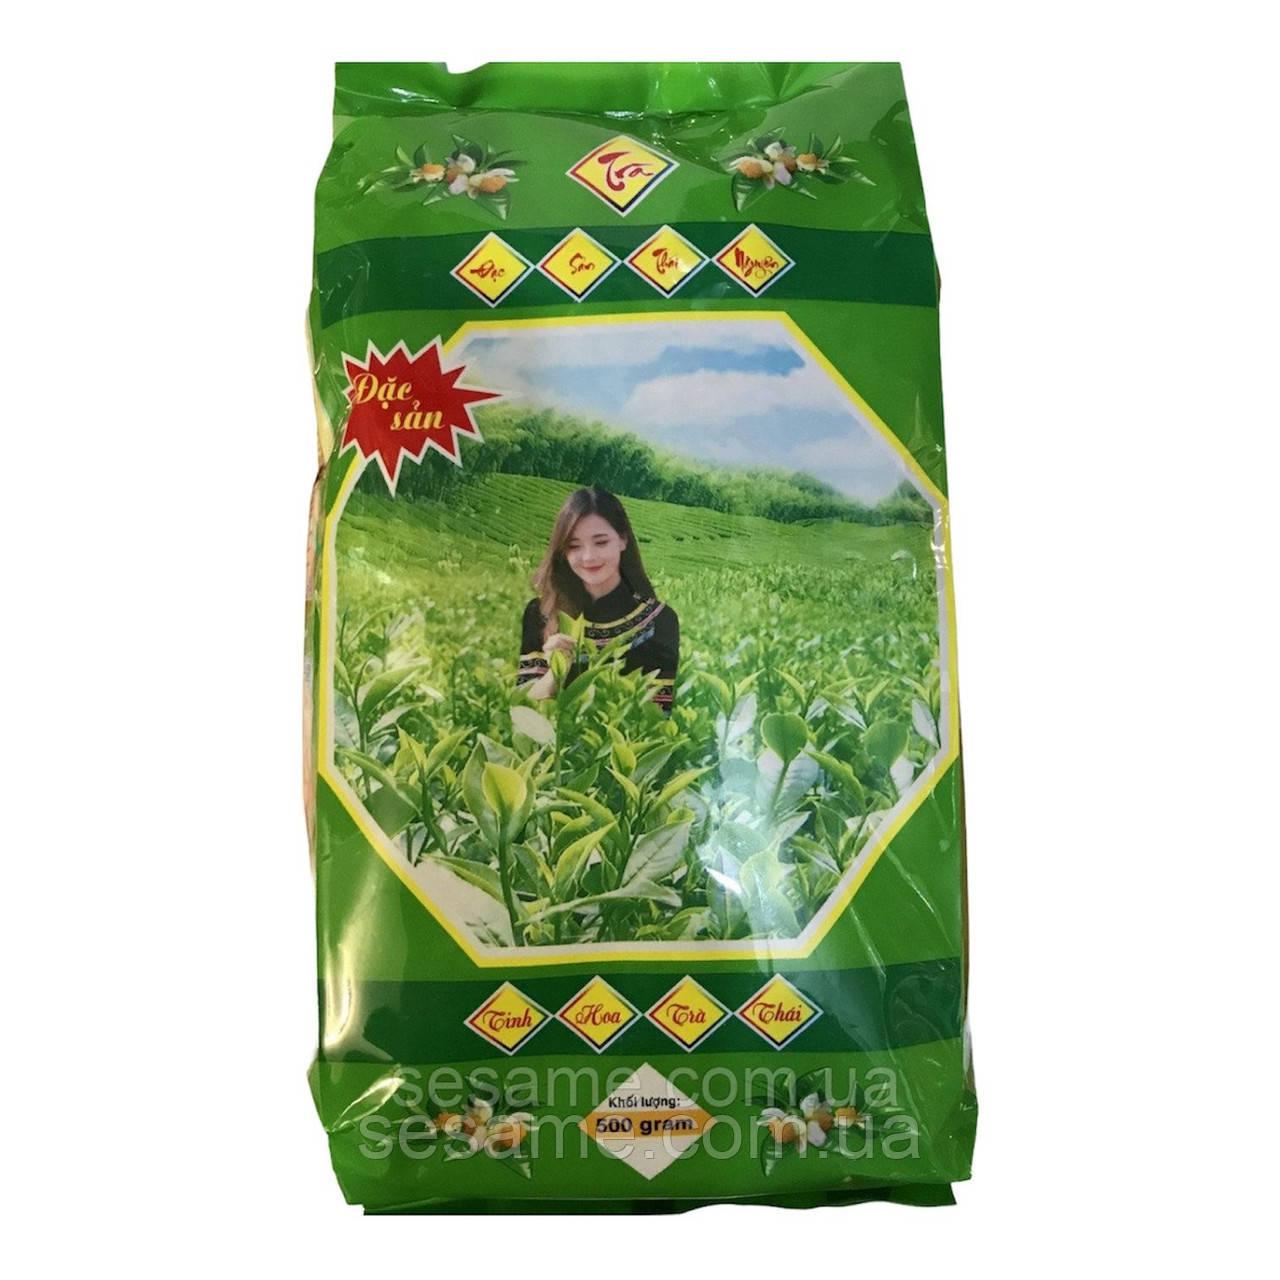 Вьетнамский фирменный Зеленый чай Tra Xanh đặc sản 200г (Вьетнам)